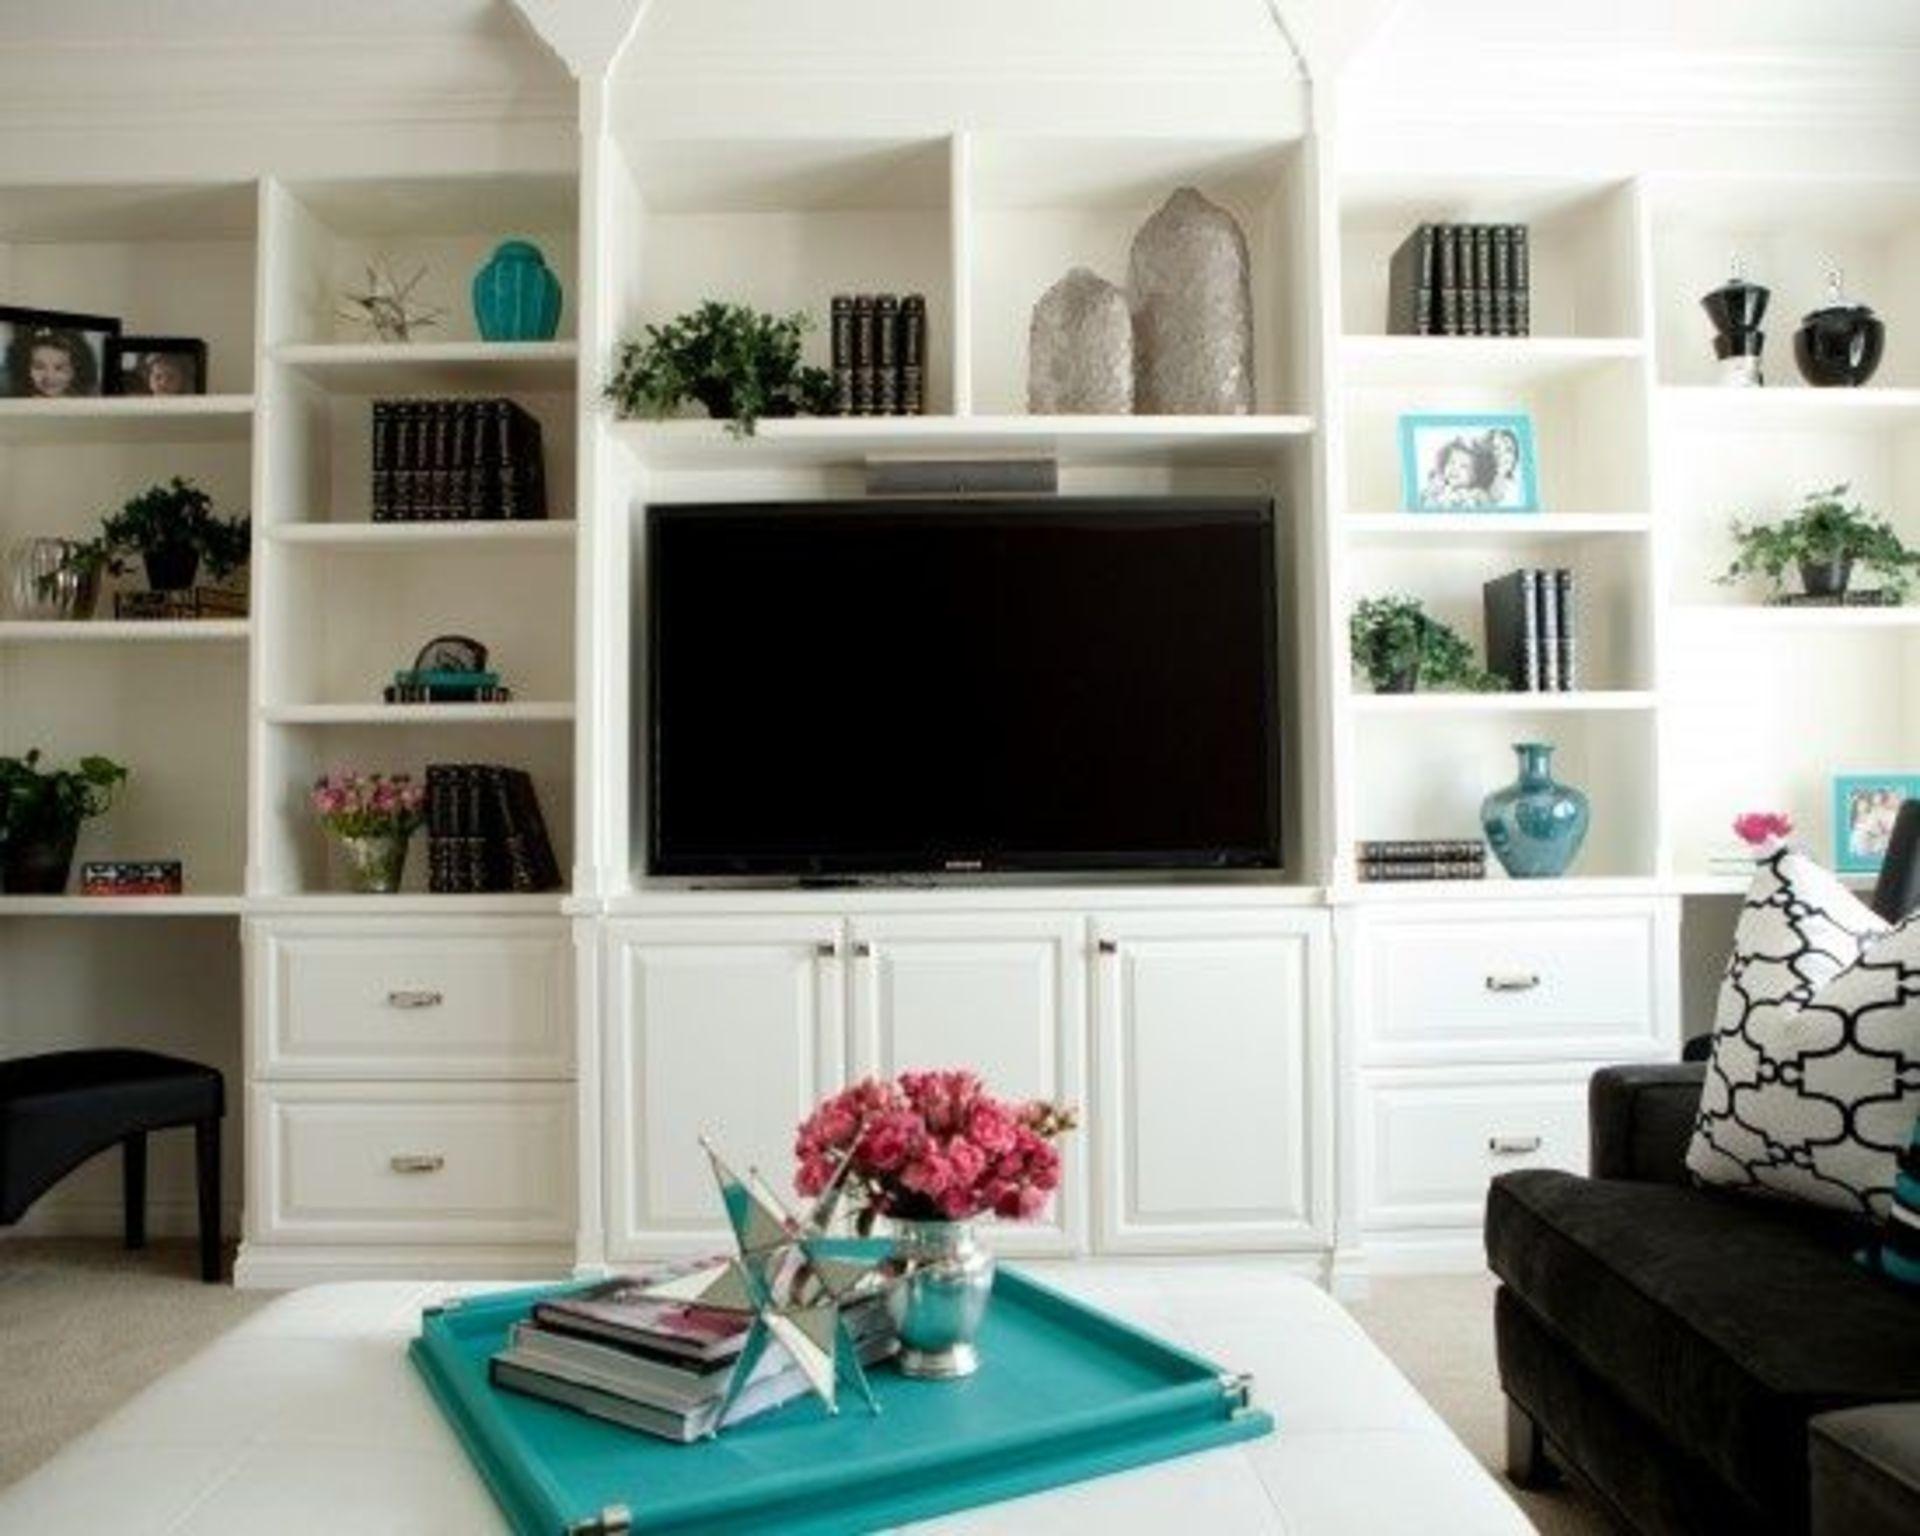 Built Ins Shelf Decorating Ideas Living Room from media.placester.com